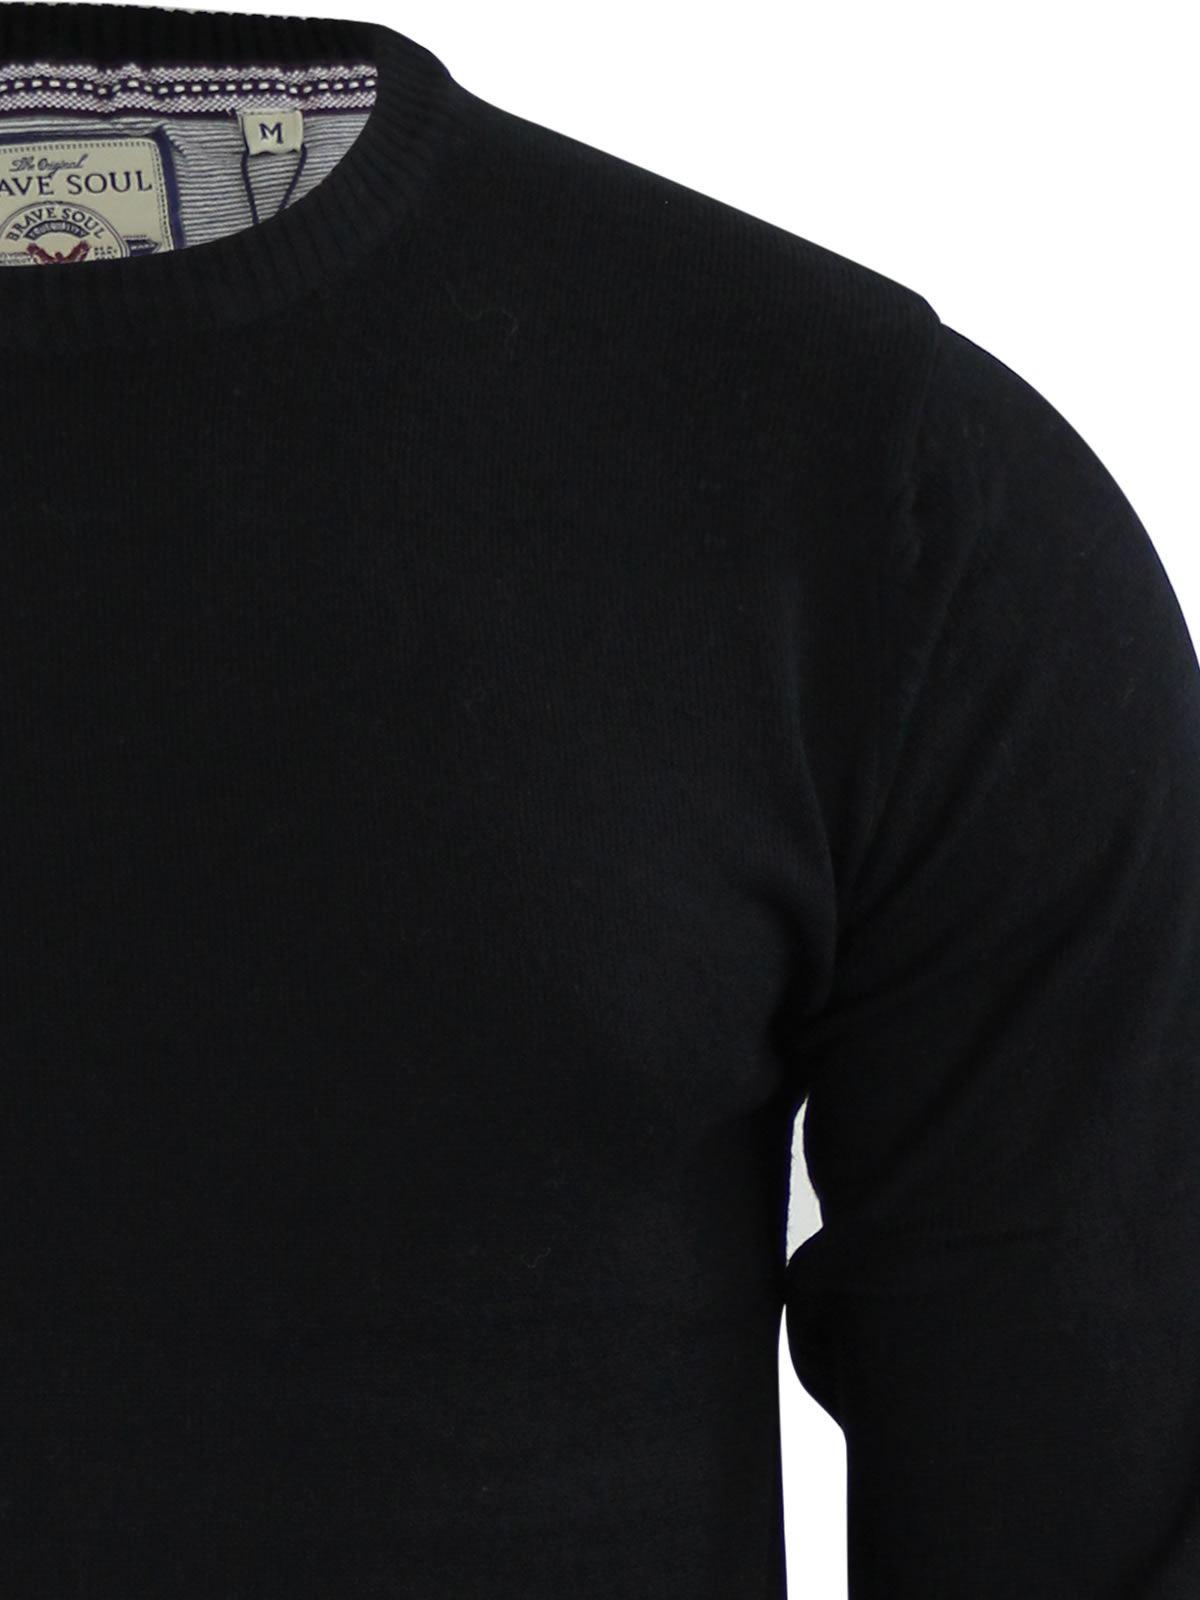 Brave-Soul-Urbain-Mens-Jumper-Knitted-Crew-Neck-Sweater thumbnail 9